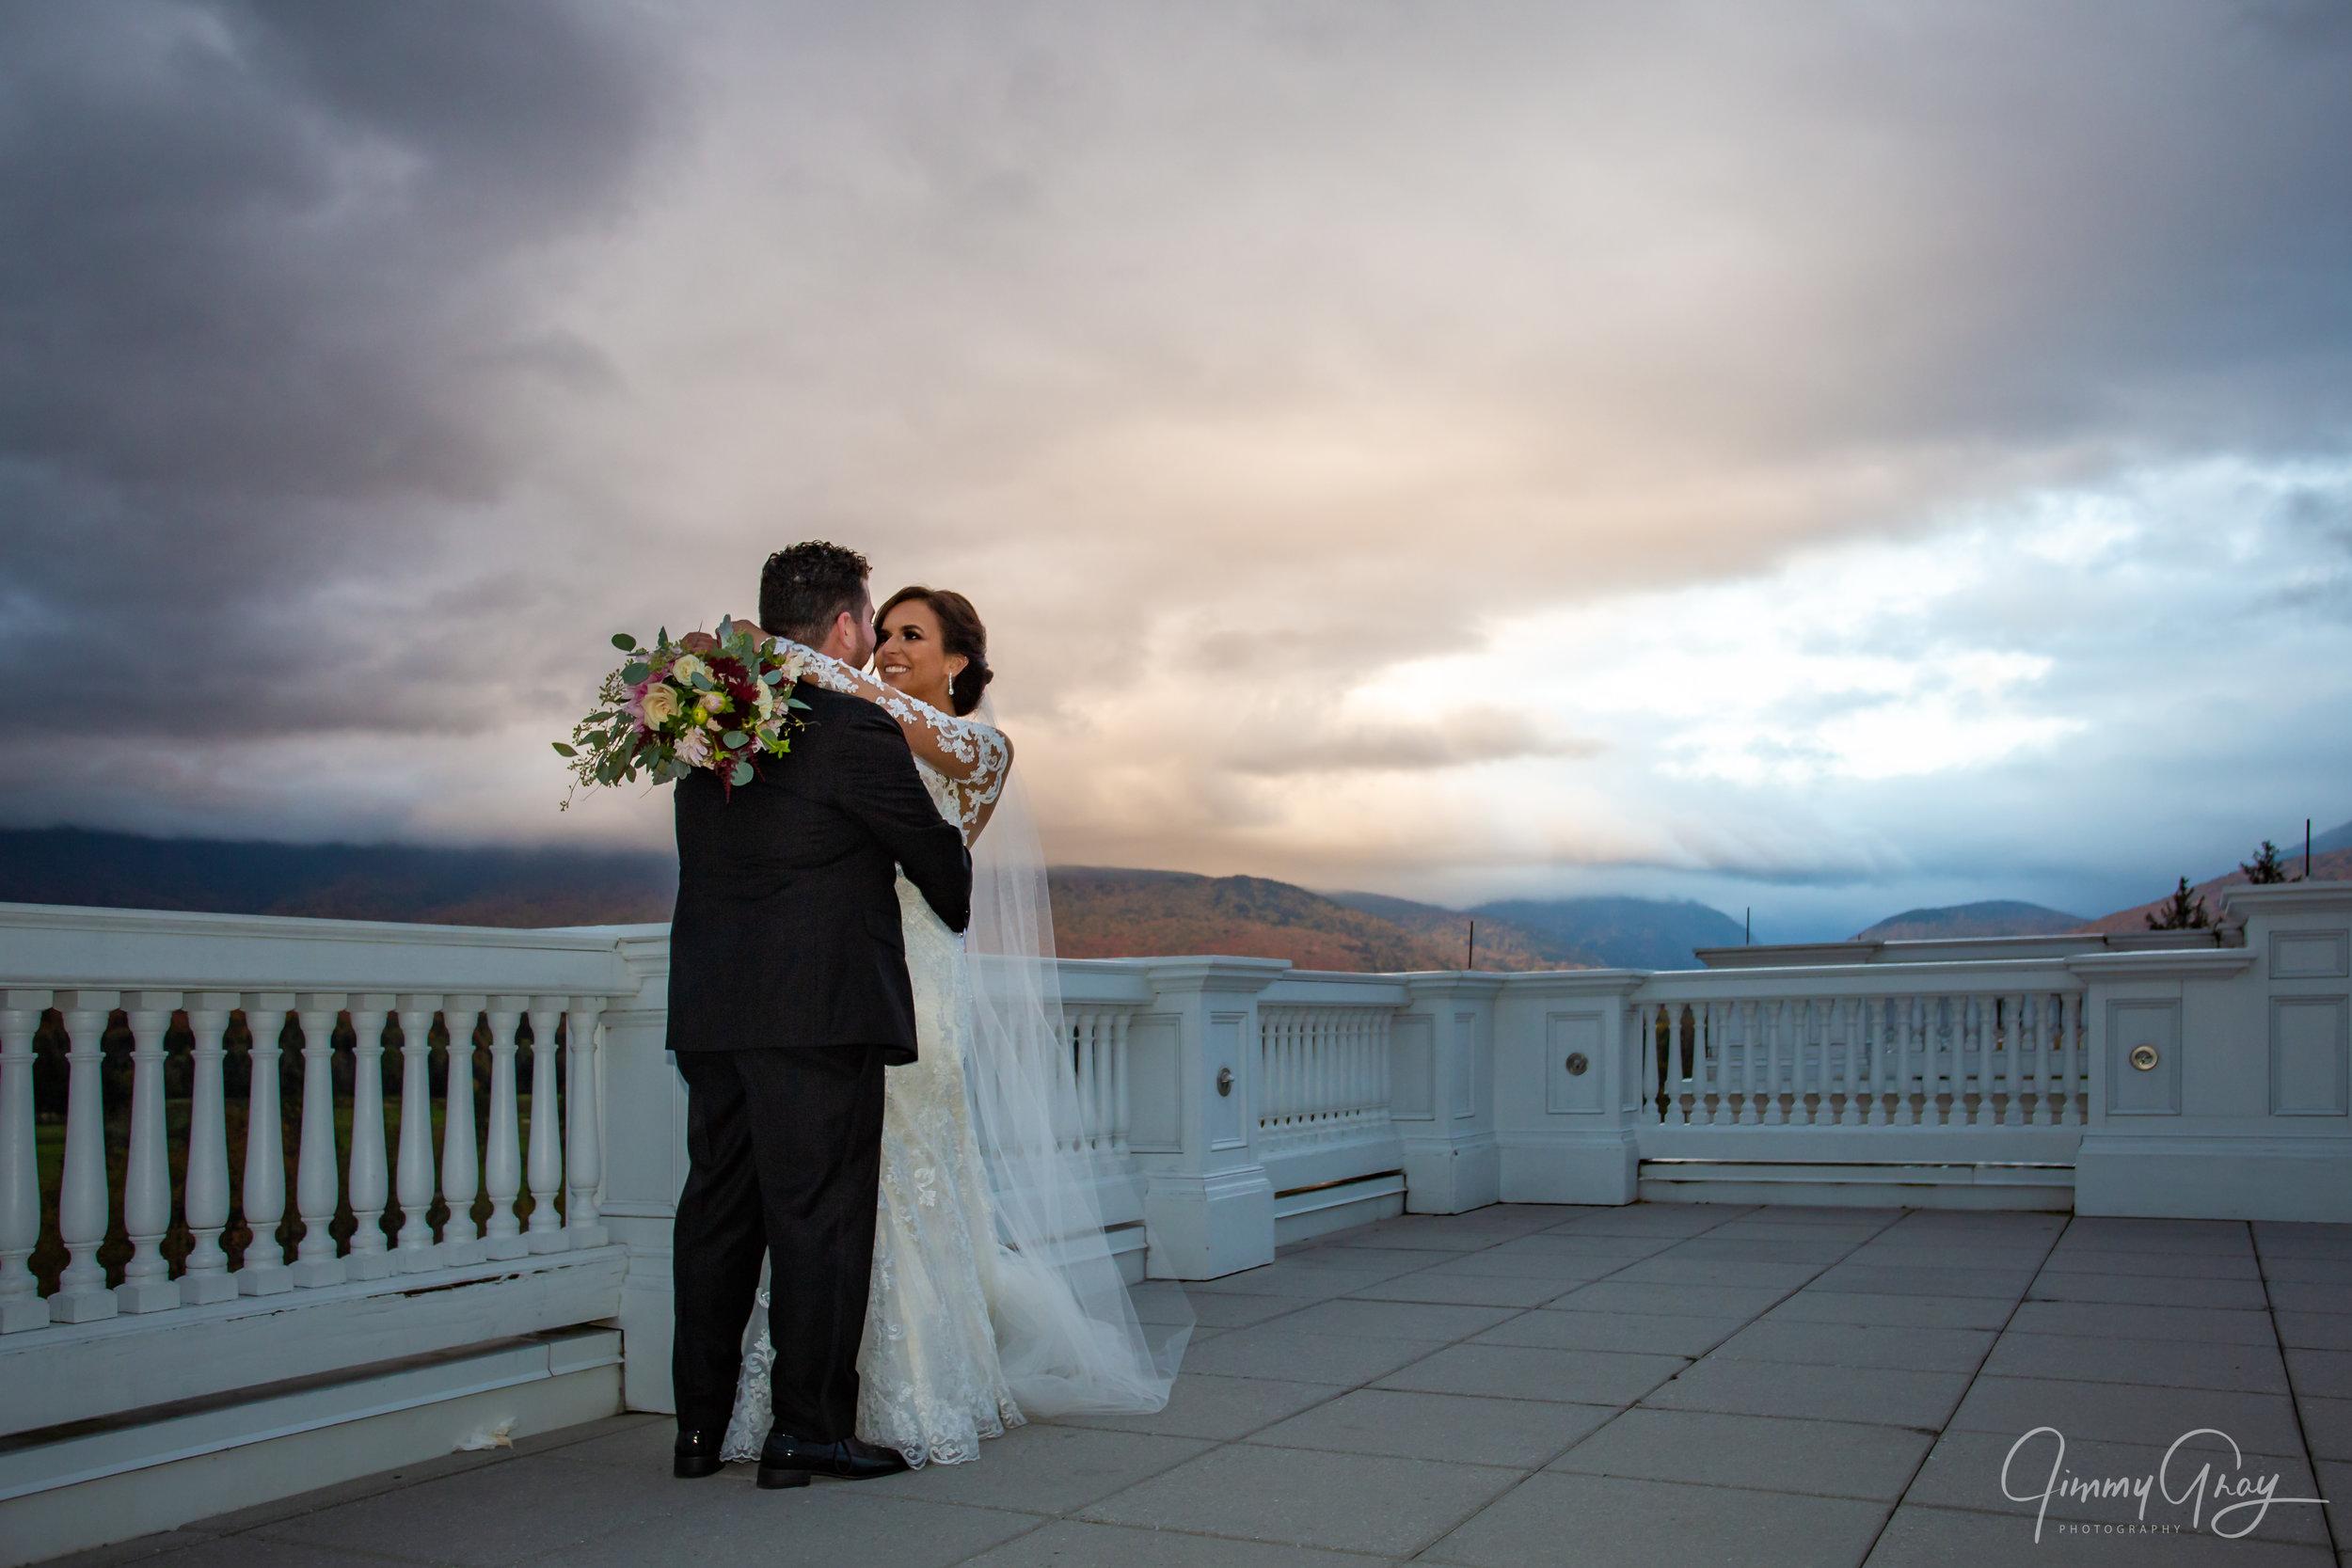 NH Wedding Photography - Jimmy Gray Photo - Bretton Woods, NH - Omni Mt. Washington Resort - Shot For MRD Photography